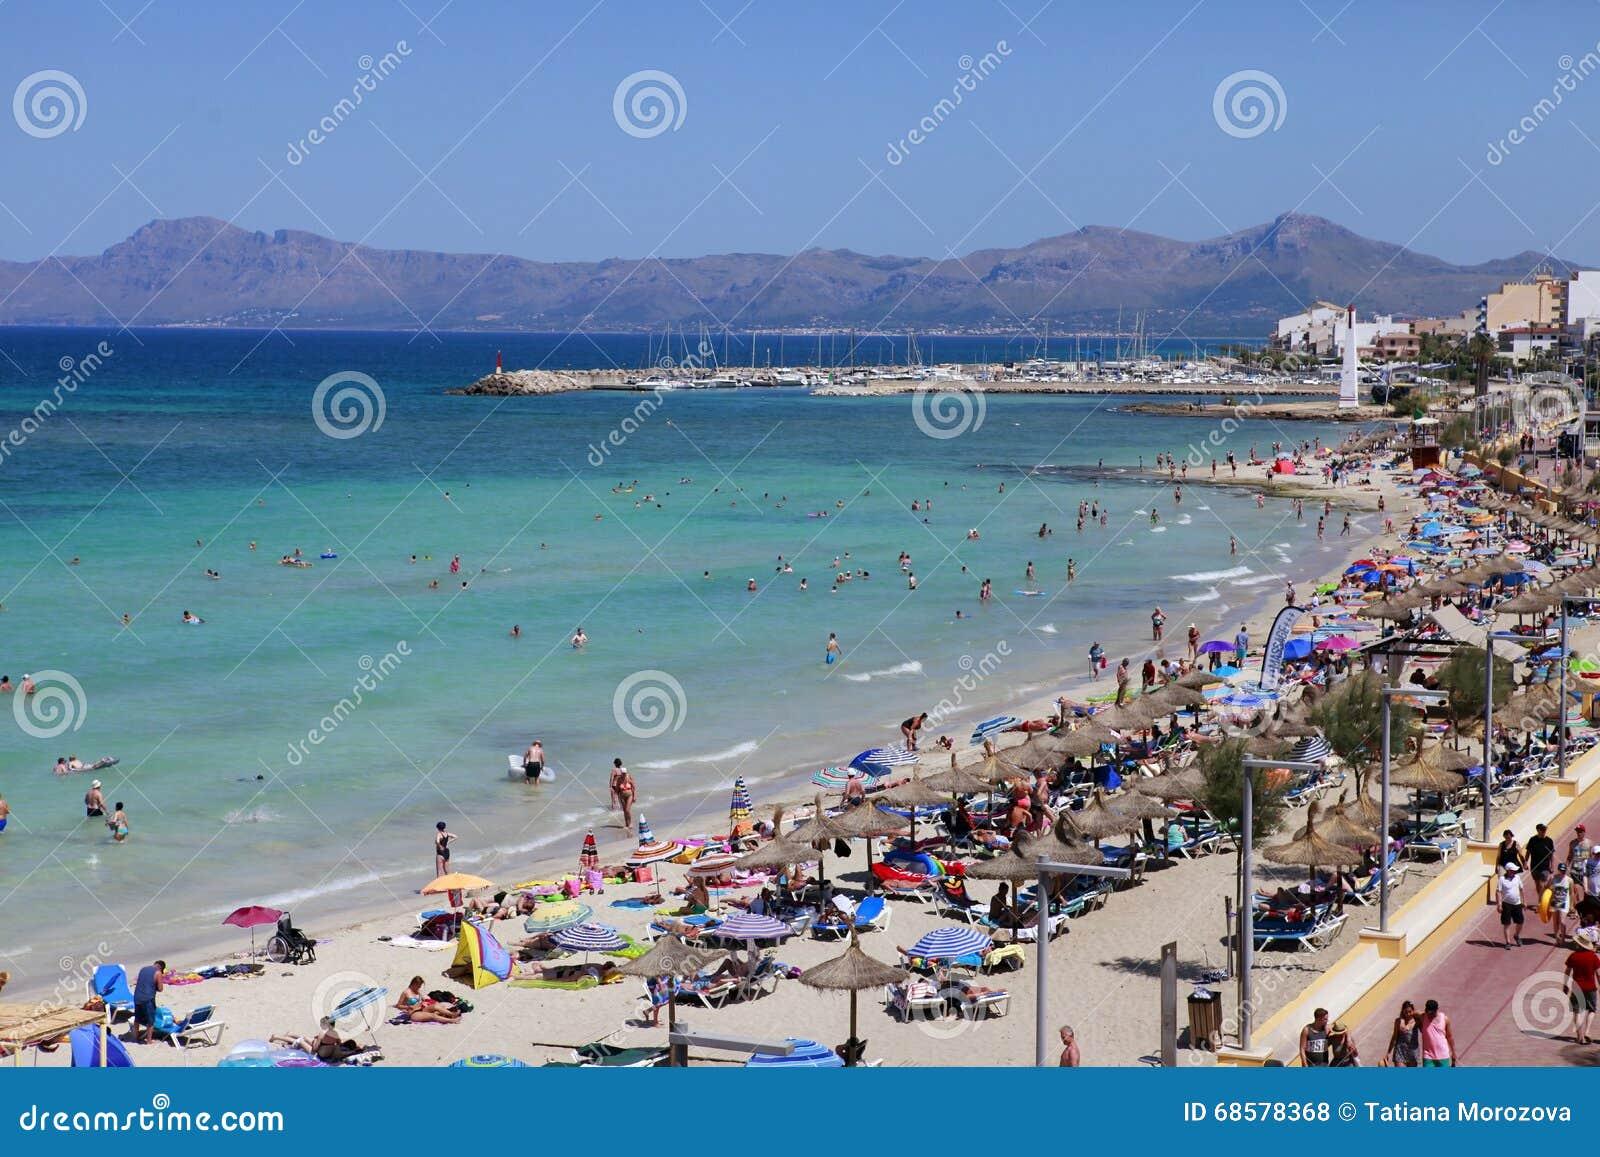 Blue Bay Hotel Mallorca